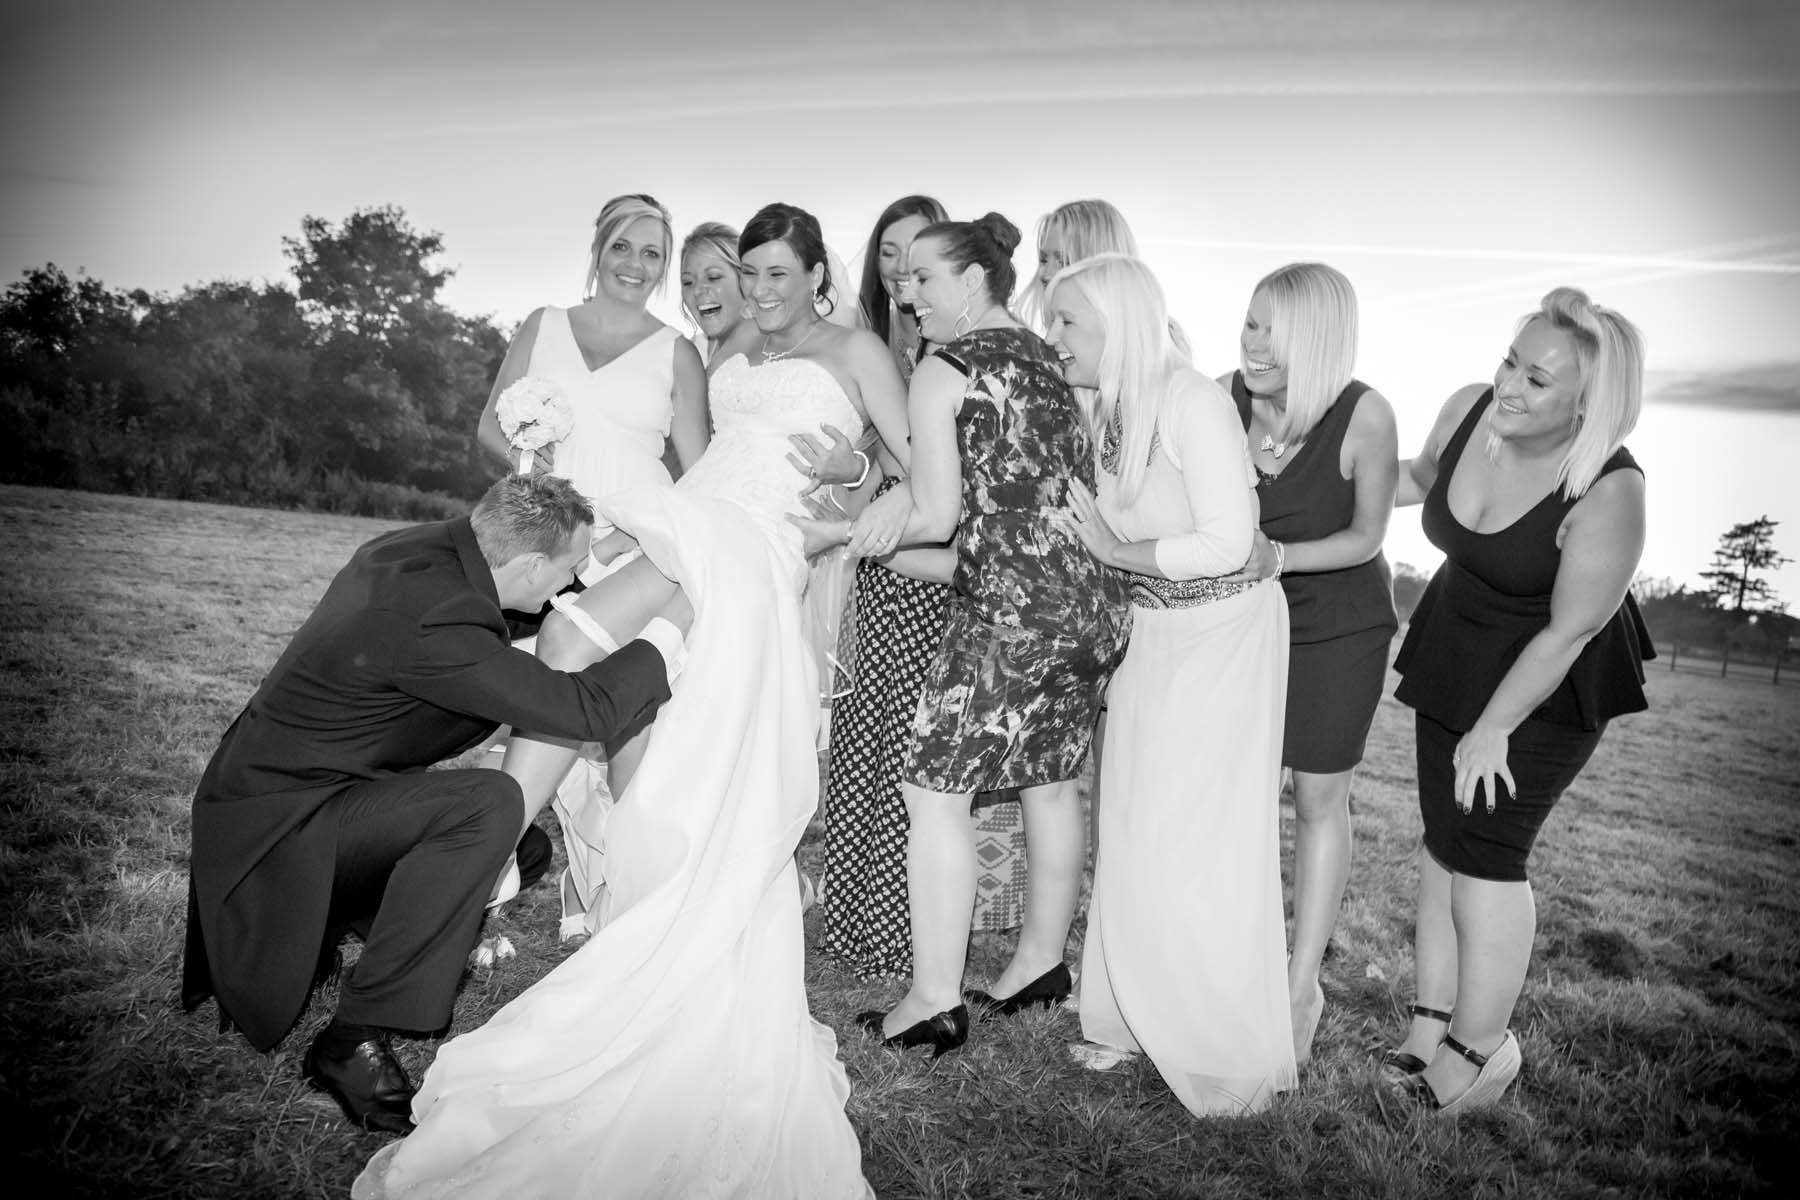 Sussex & Surrey Wedding Photographer - Guests & Groups (25)